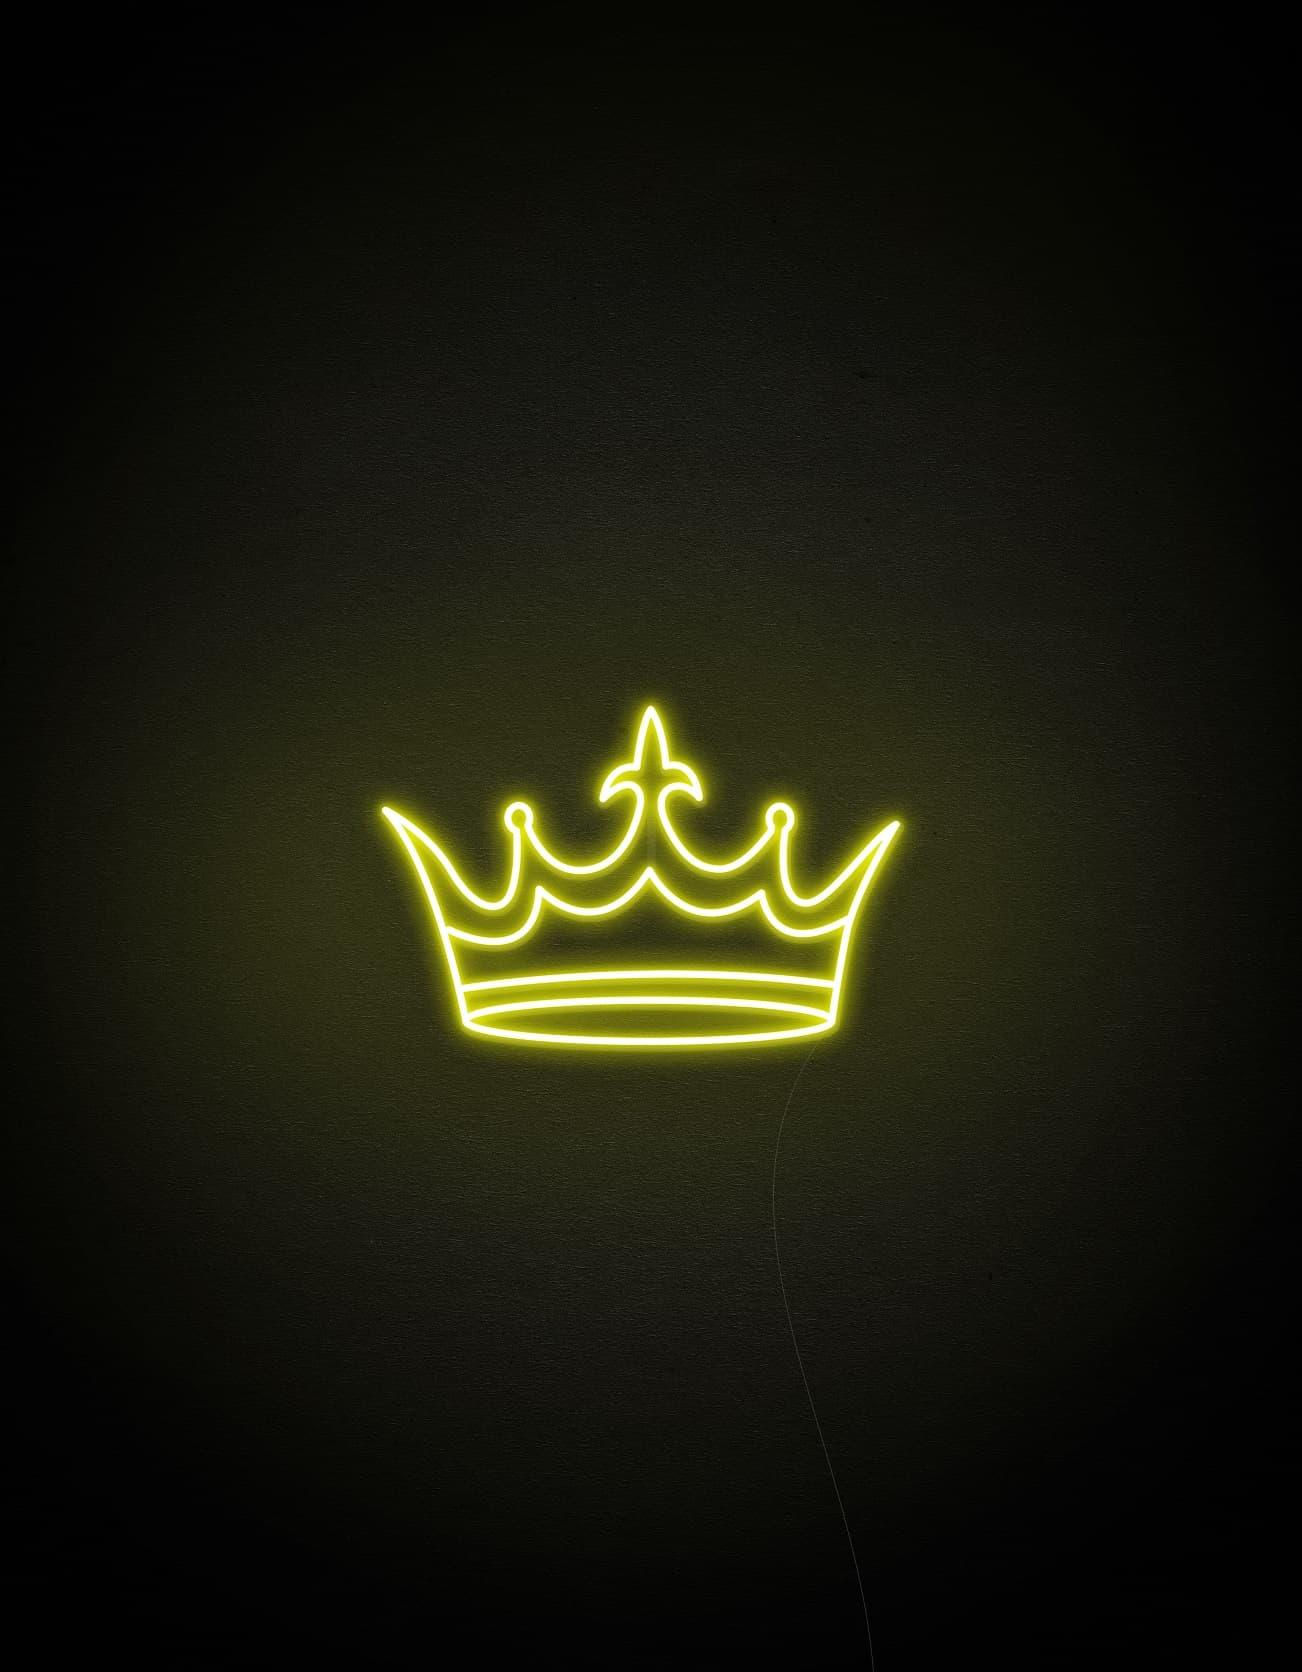 crown neon light